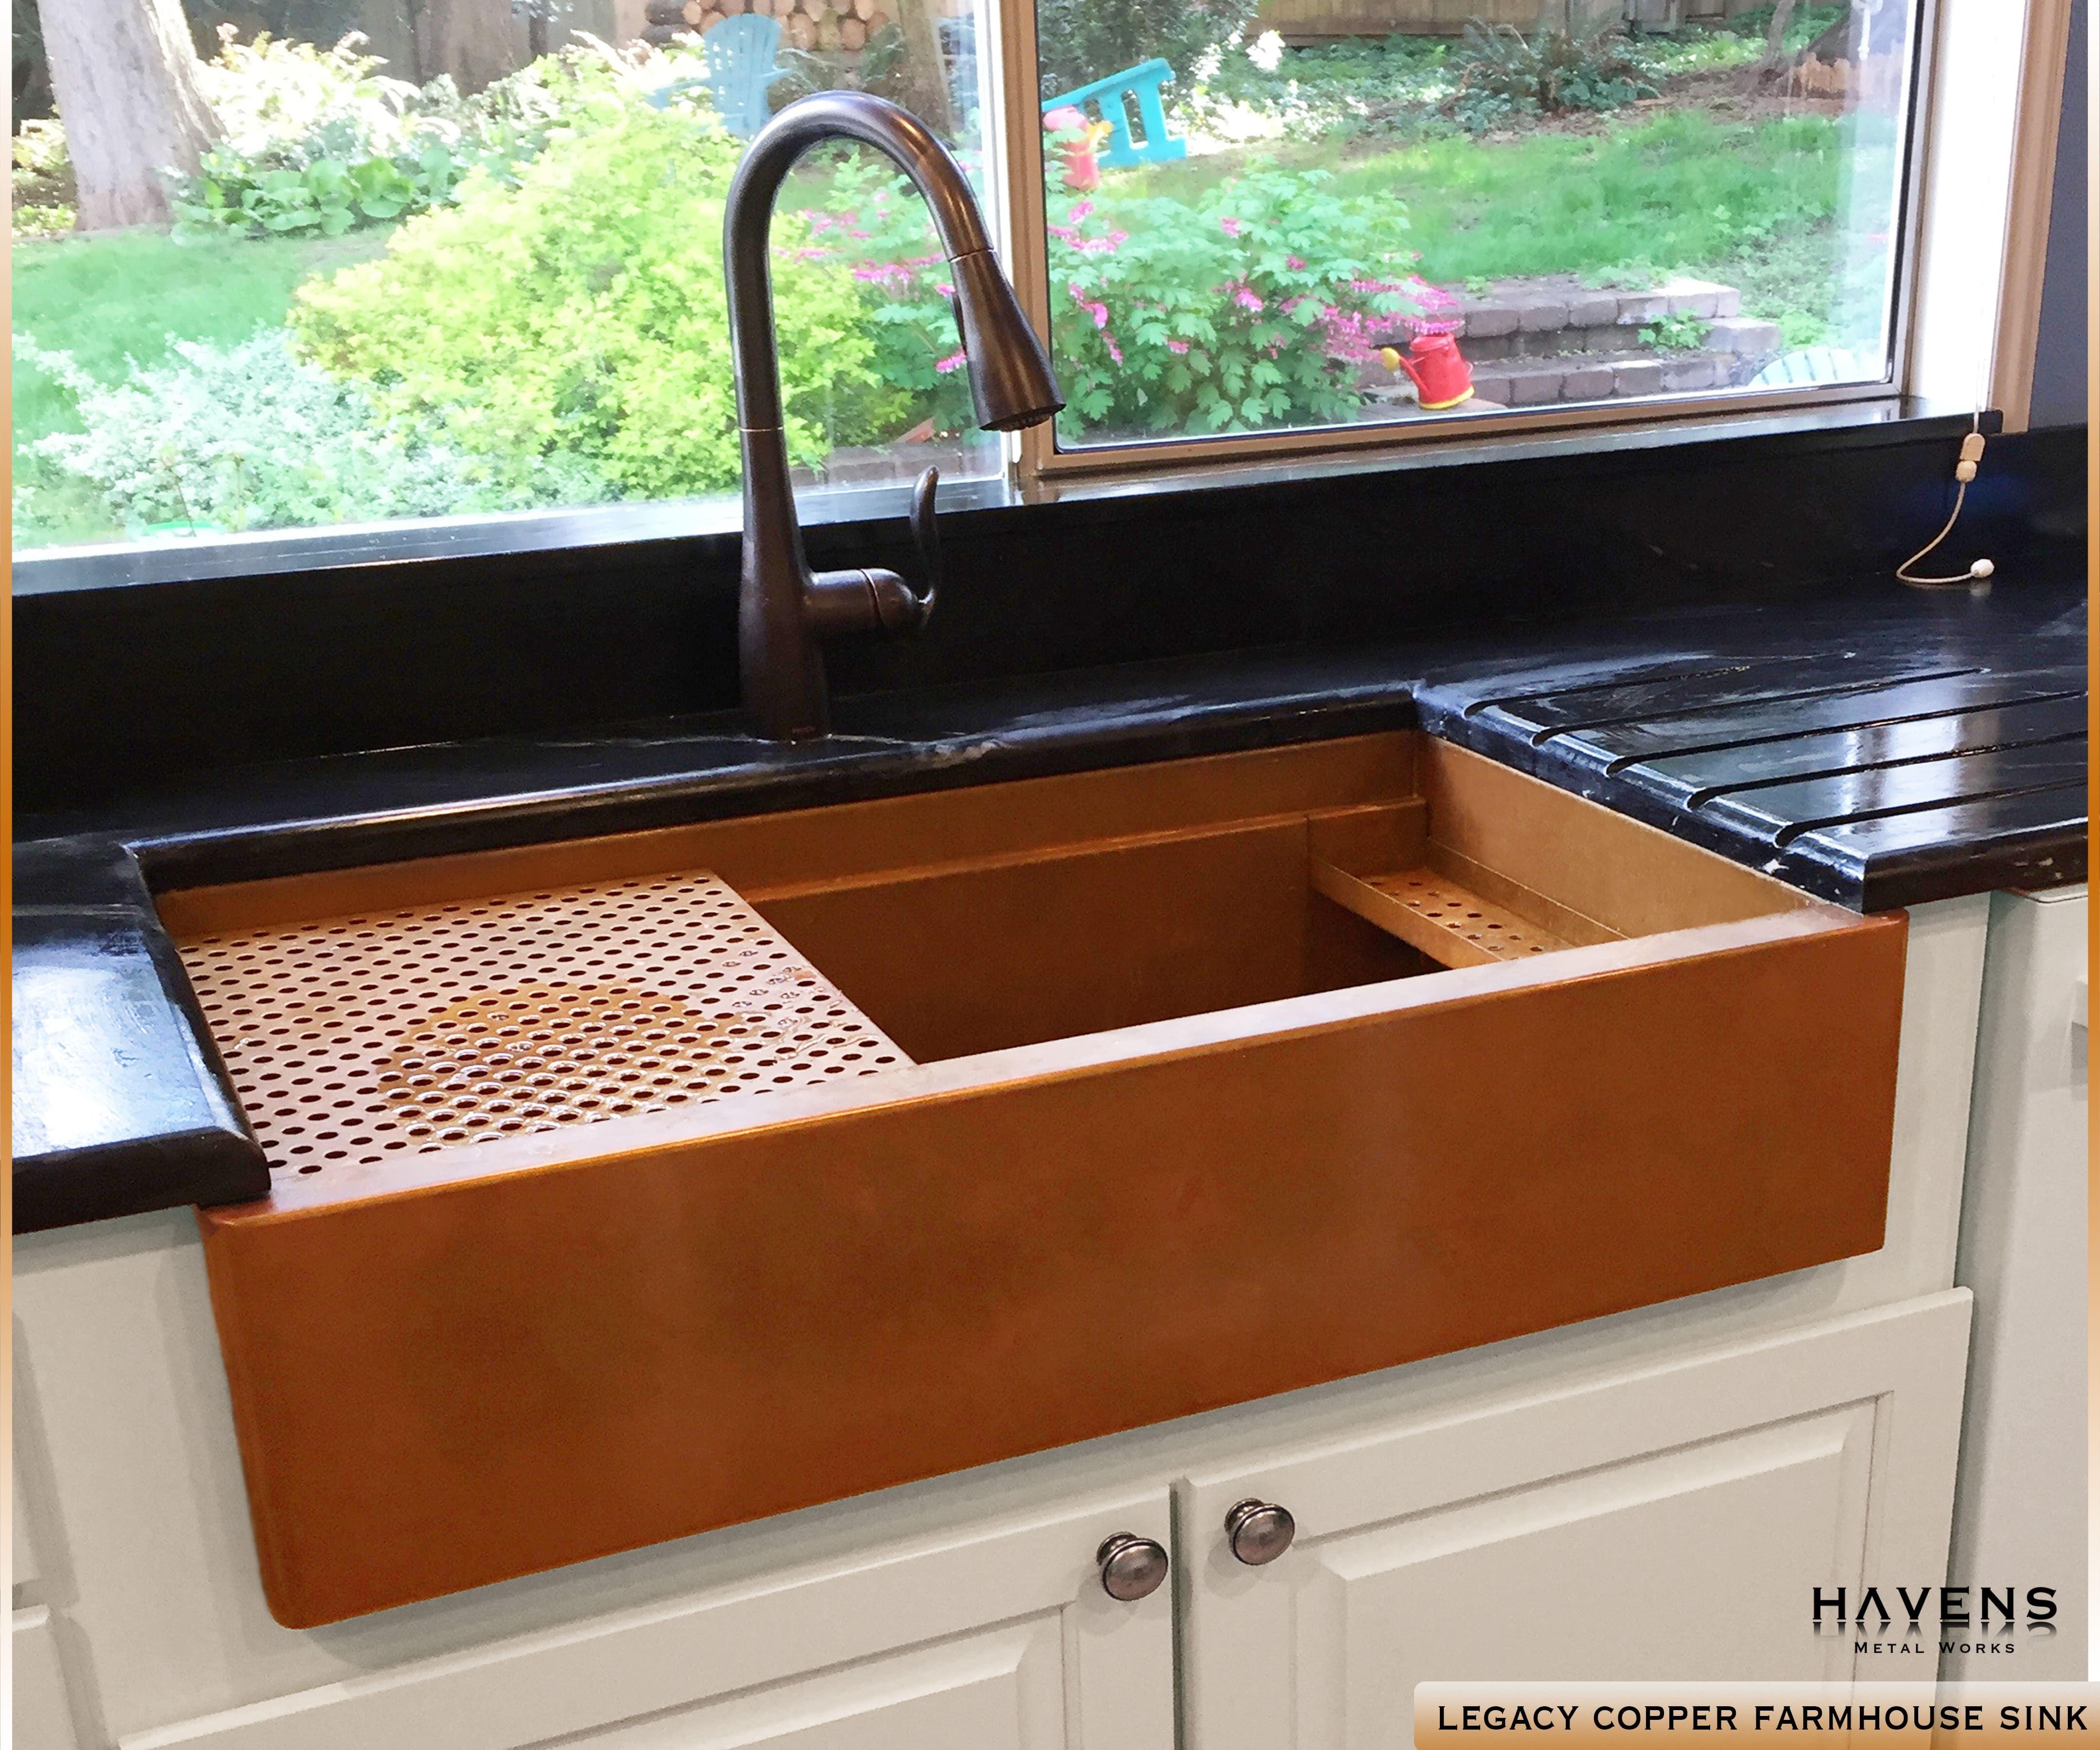 Legacy Copper Farmhouse Sink In 2020 Copper Farmhouse Sinks